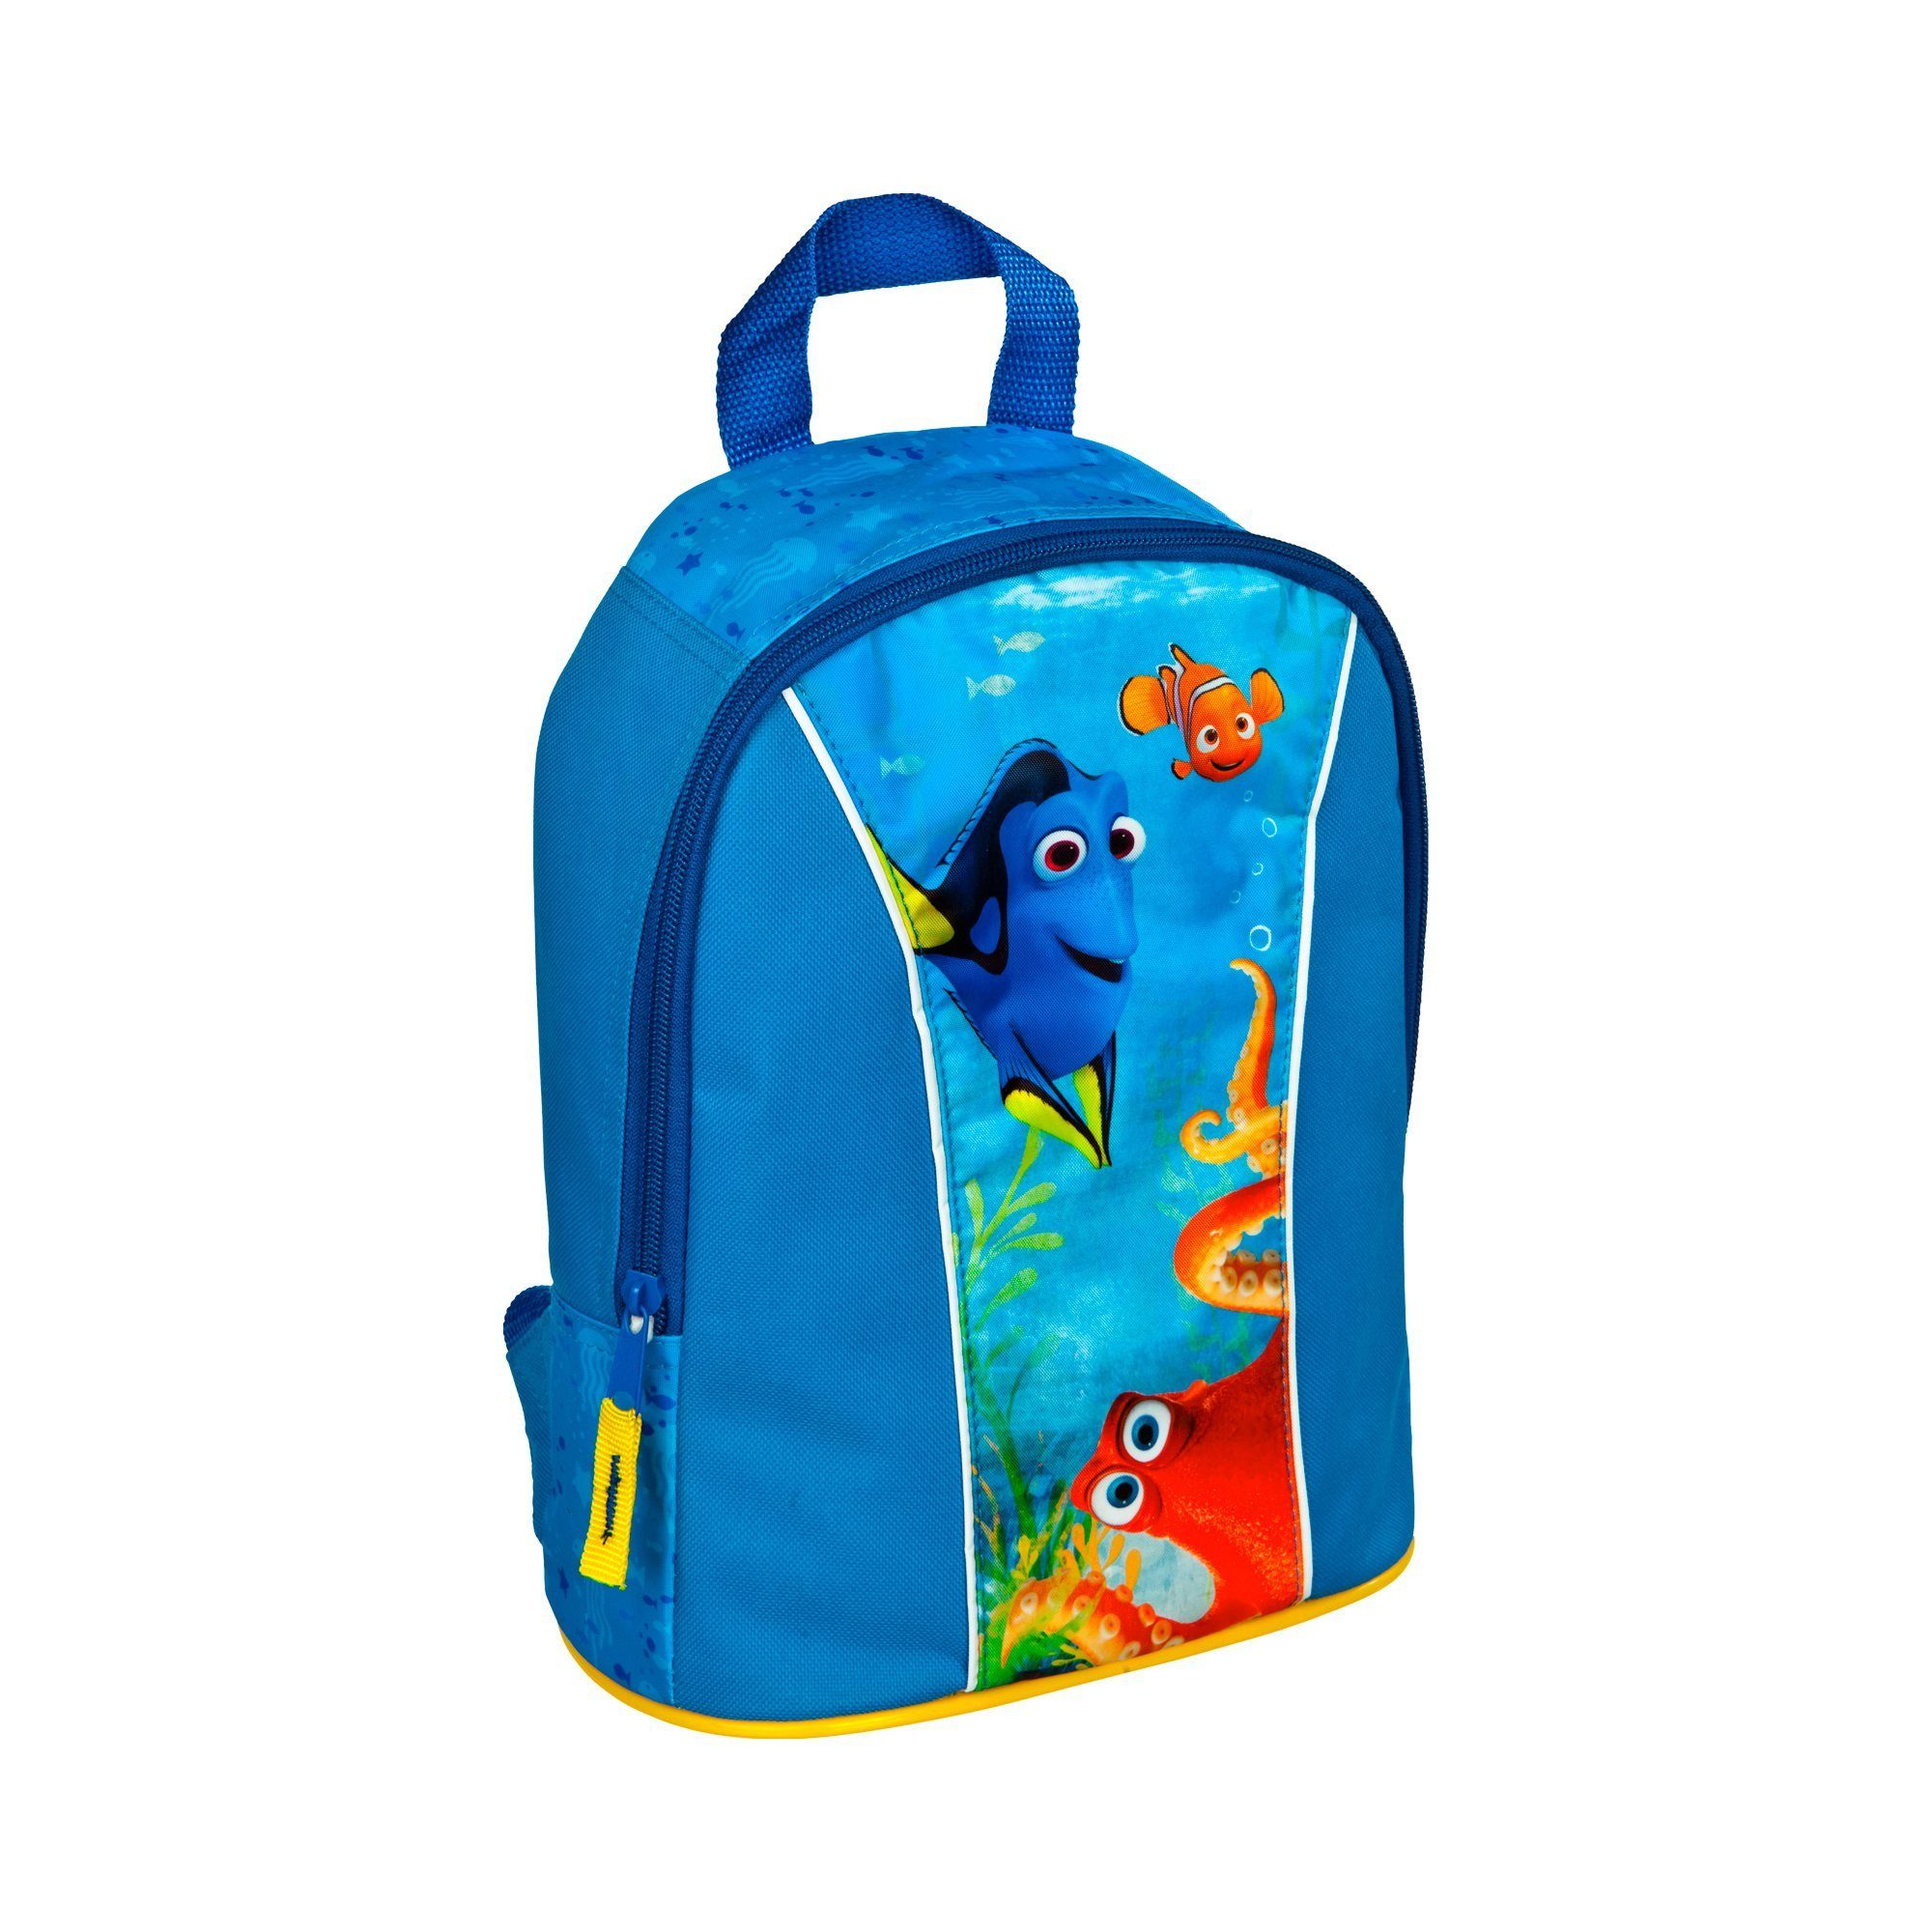 Undercover Kindergartenrucksack